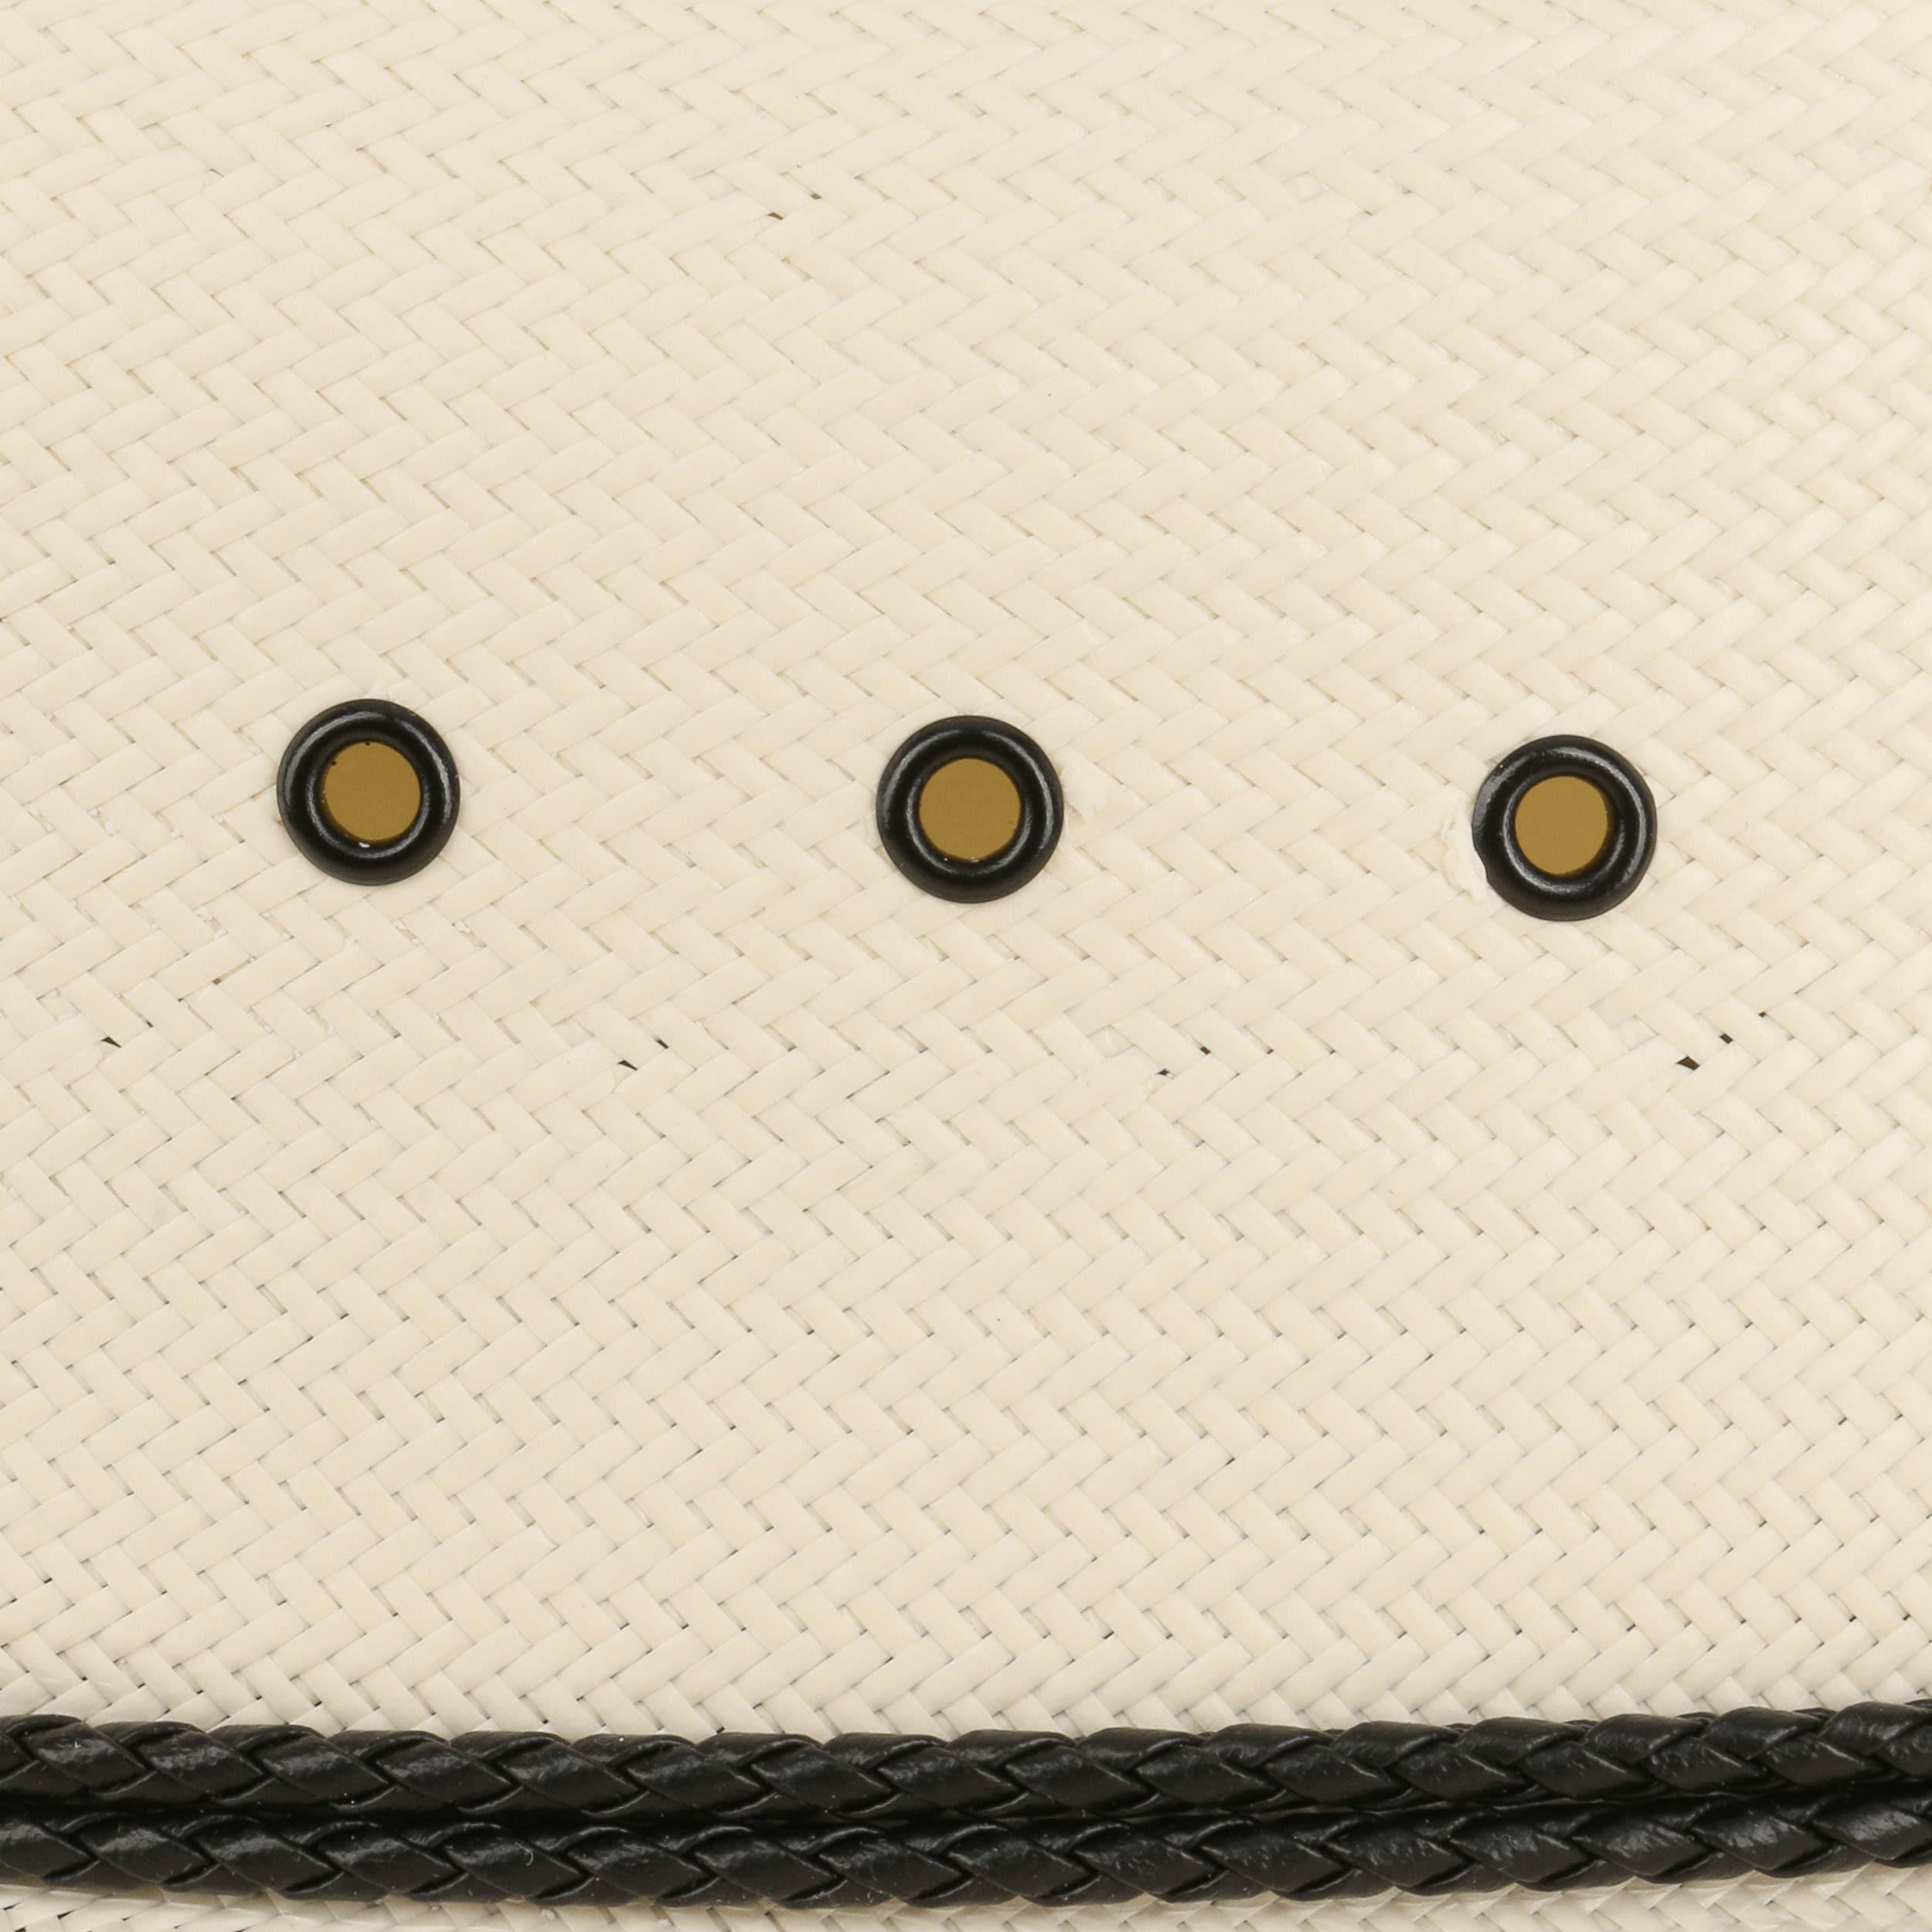 ... Sombrero de Paja Oeste Comfort 10X by Stetson - blanco crema 4 ... 904d73cd488